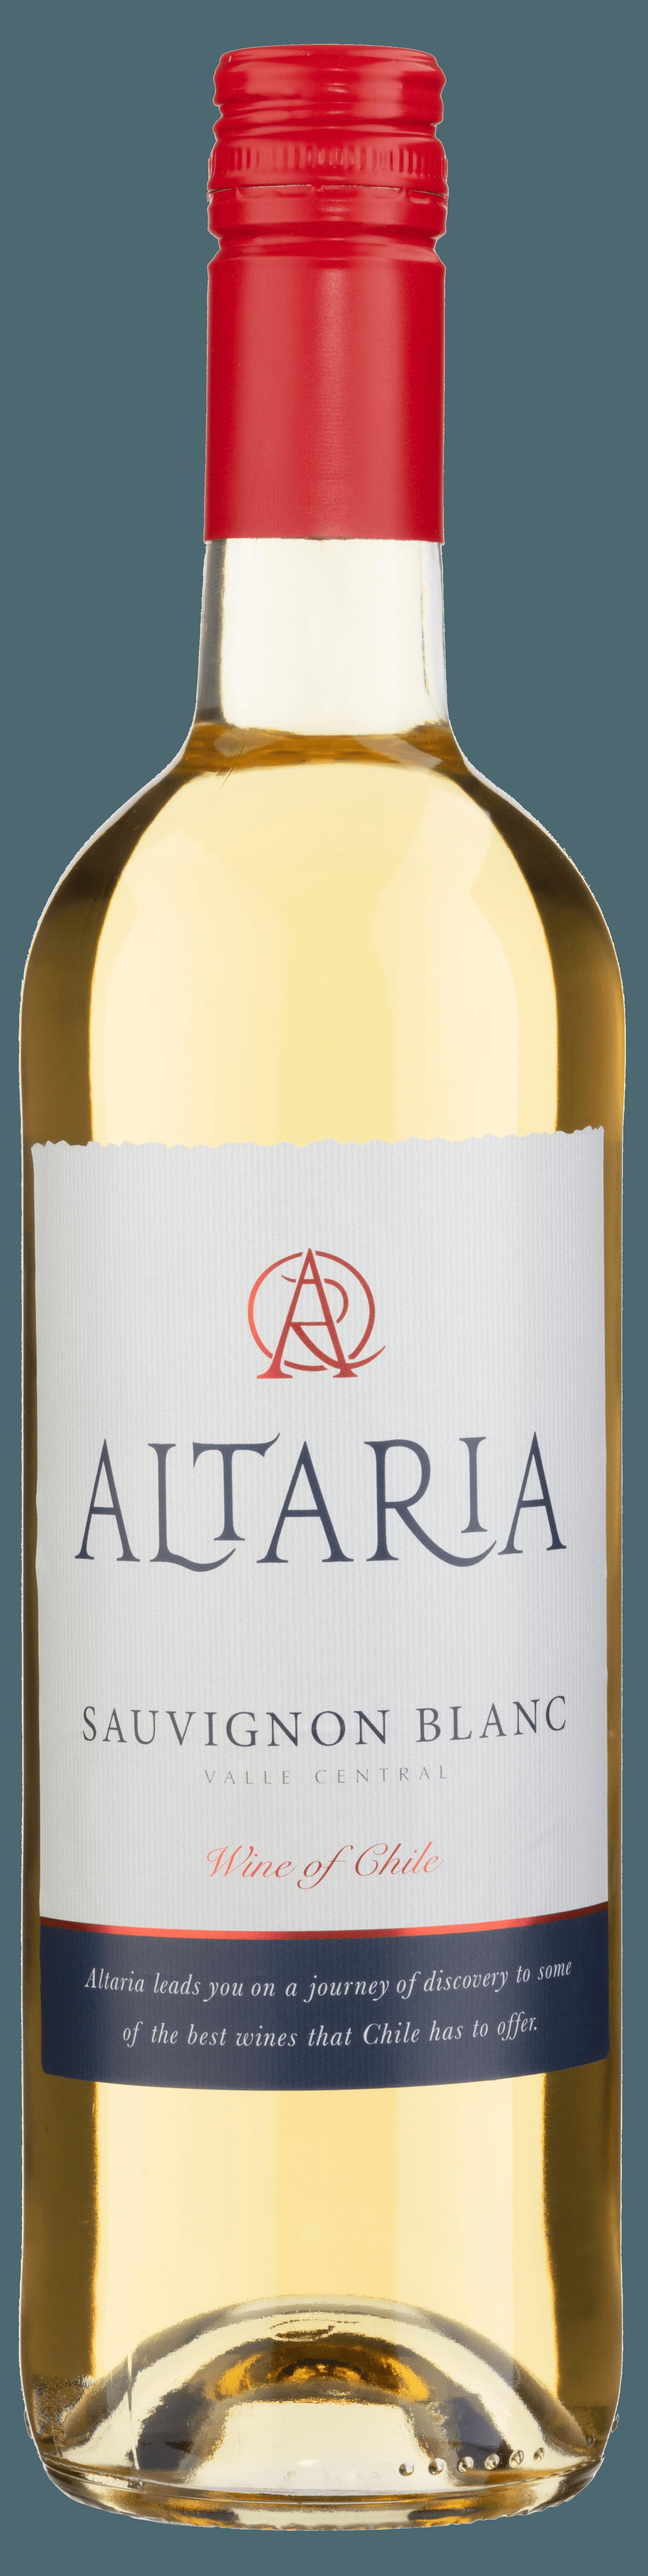 Image 0: Altaria Sauvignon Blanc